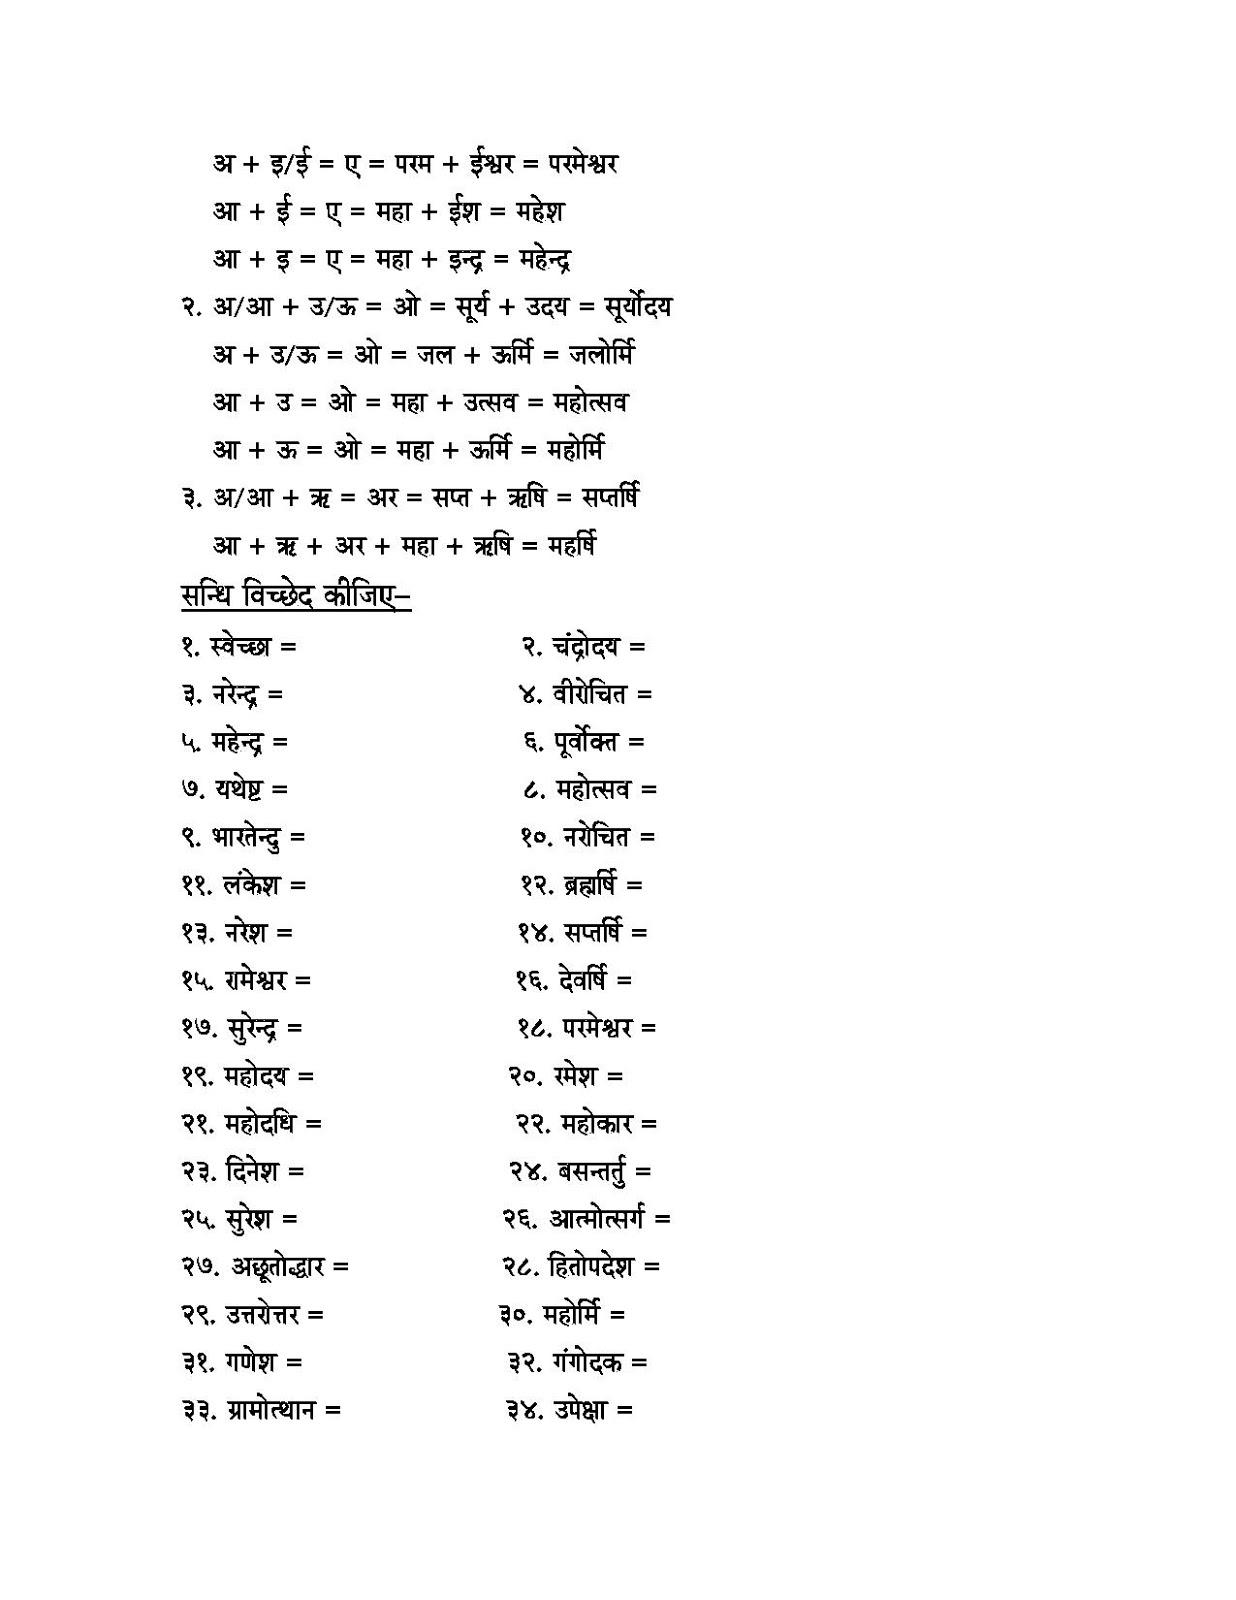 hight resolution of Karak Worksheet For Class 5 - Awesome Worksheet